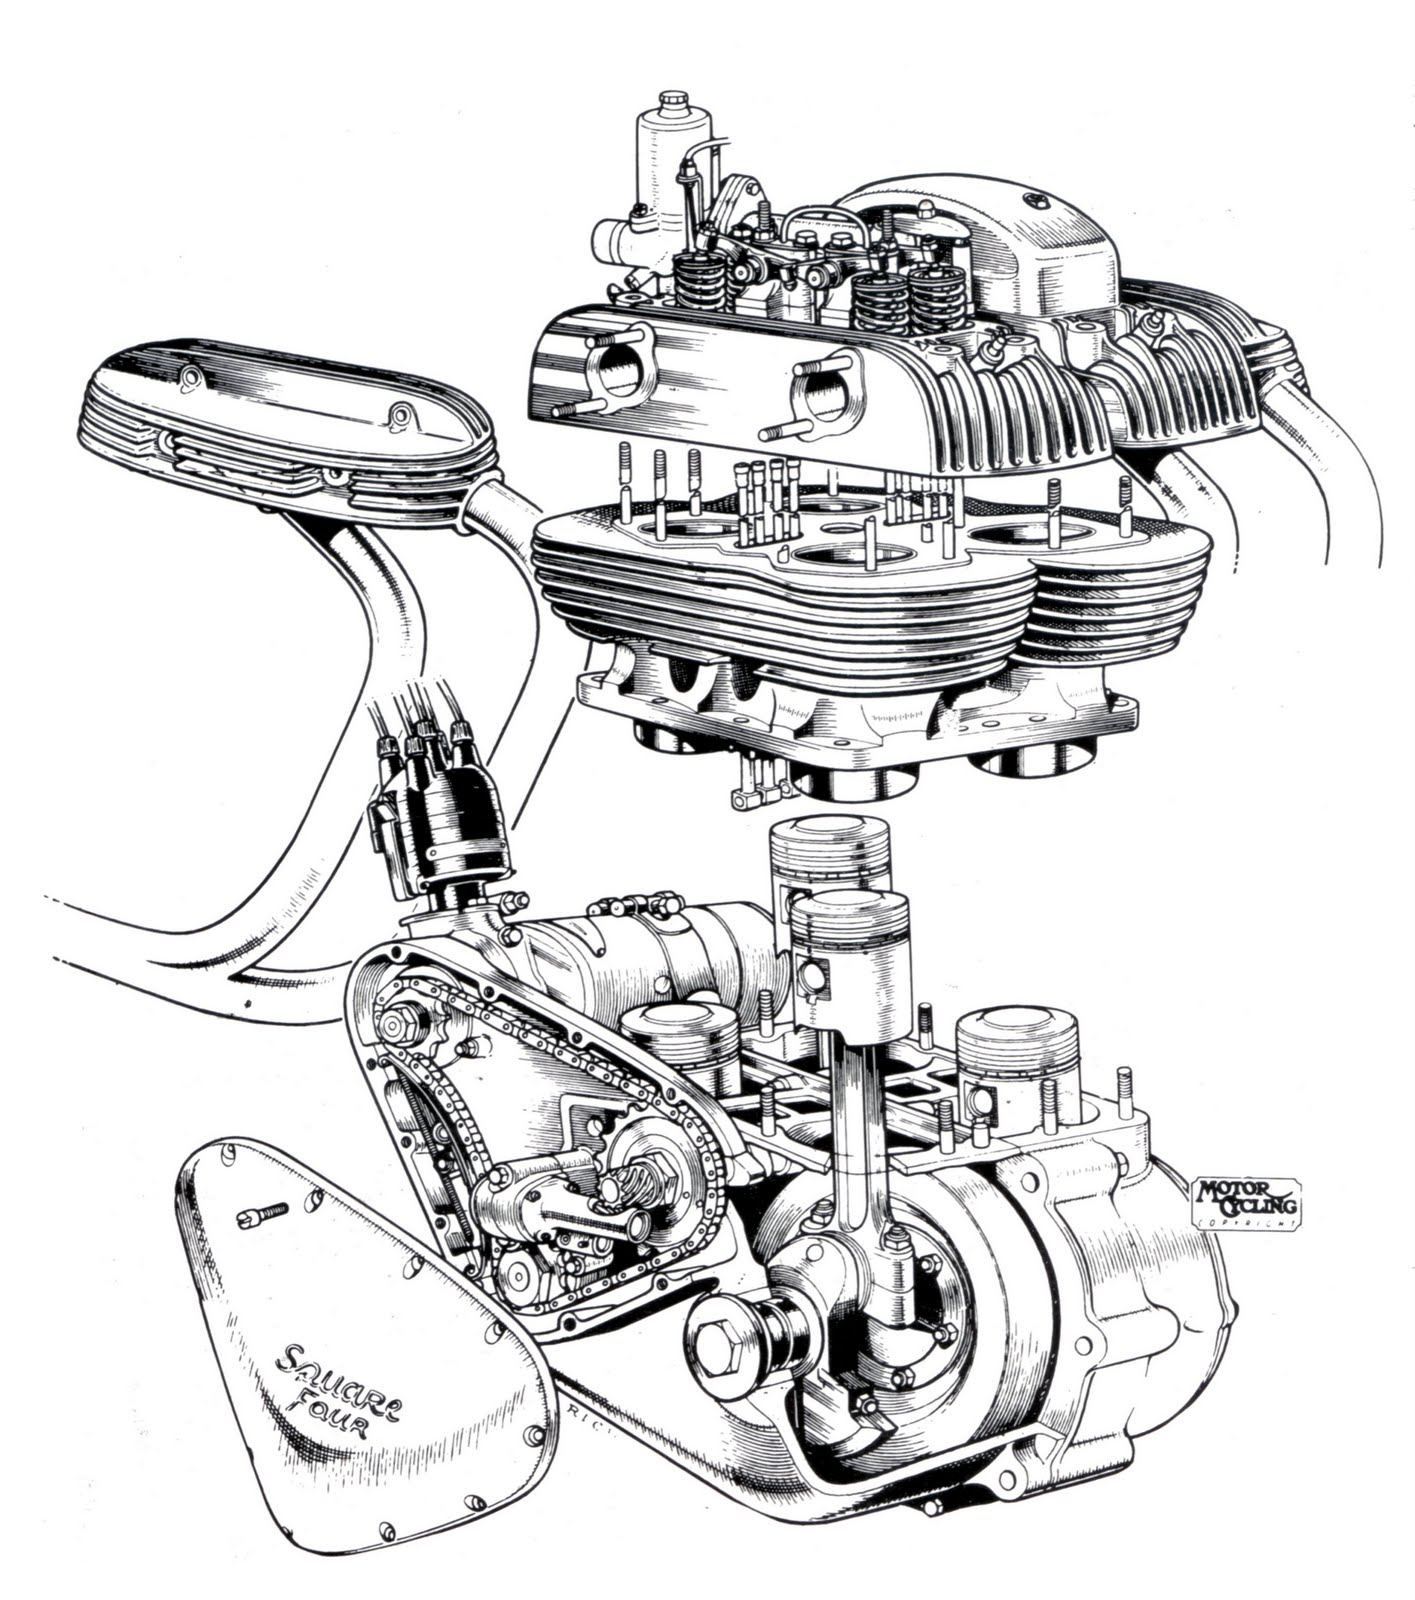 Rotary Race Engine